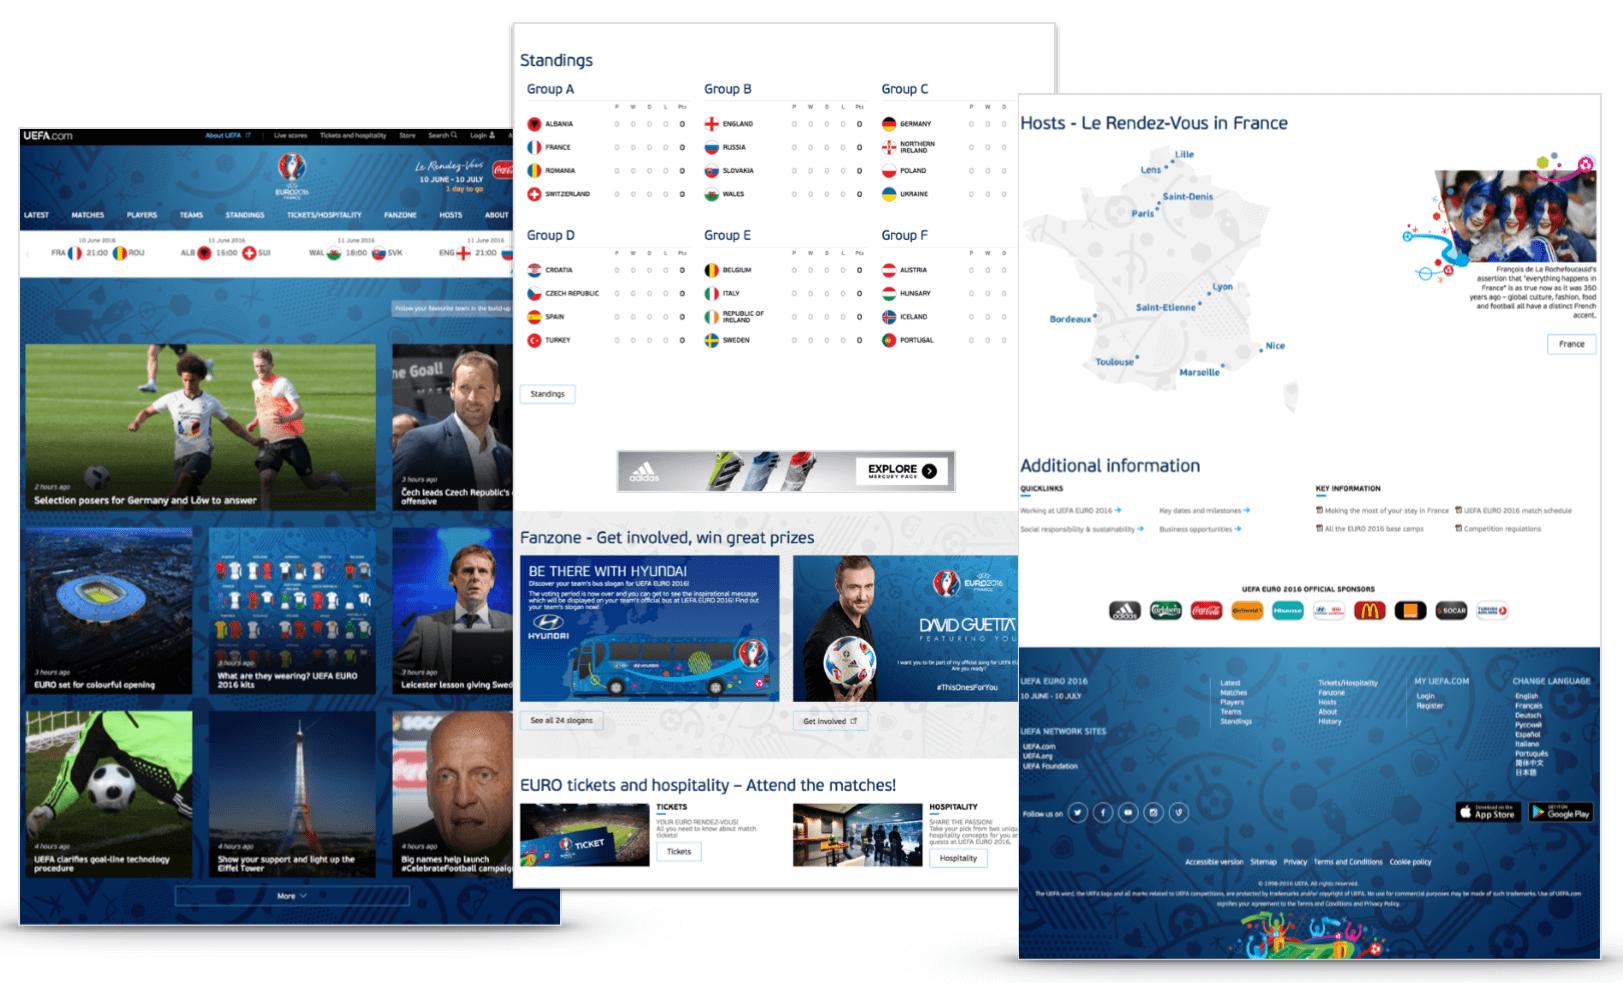 Content on Uefa.com